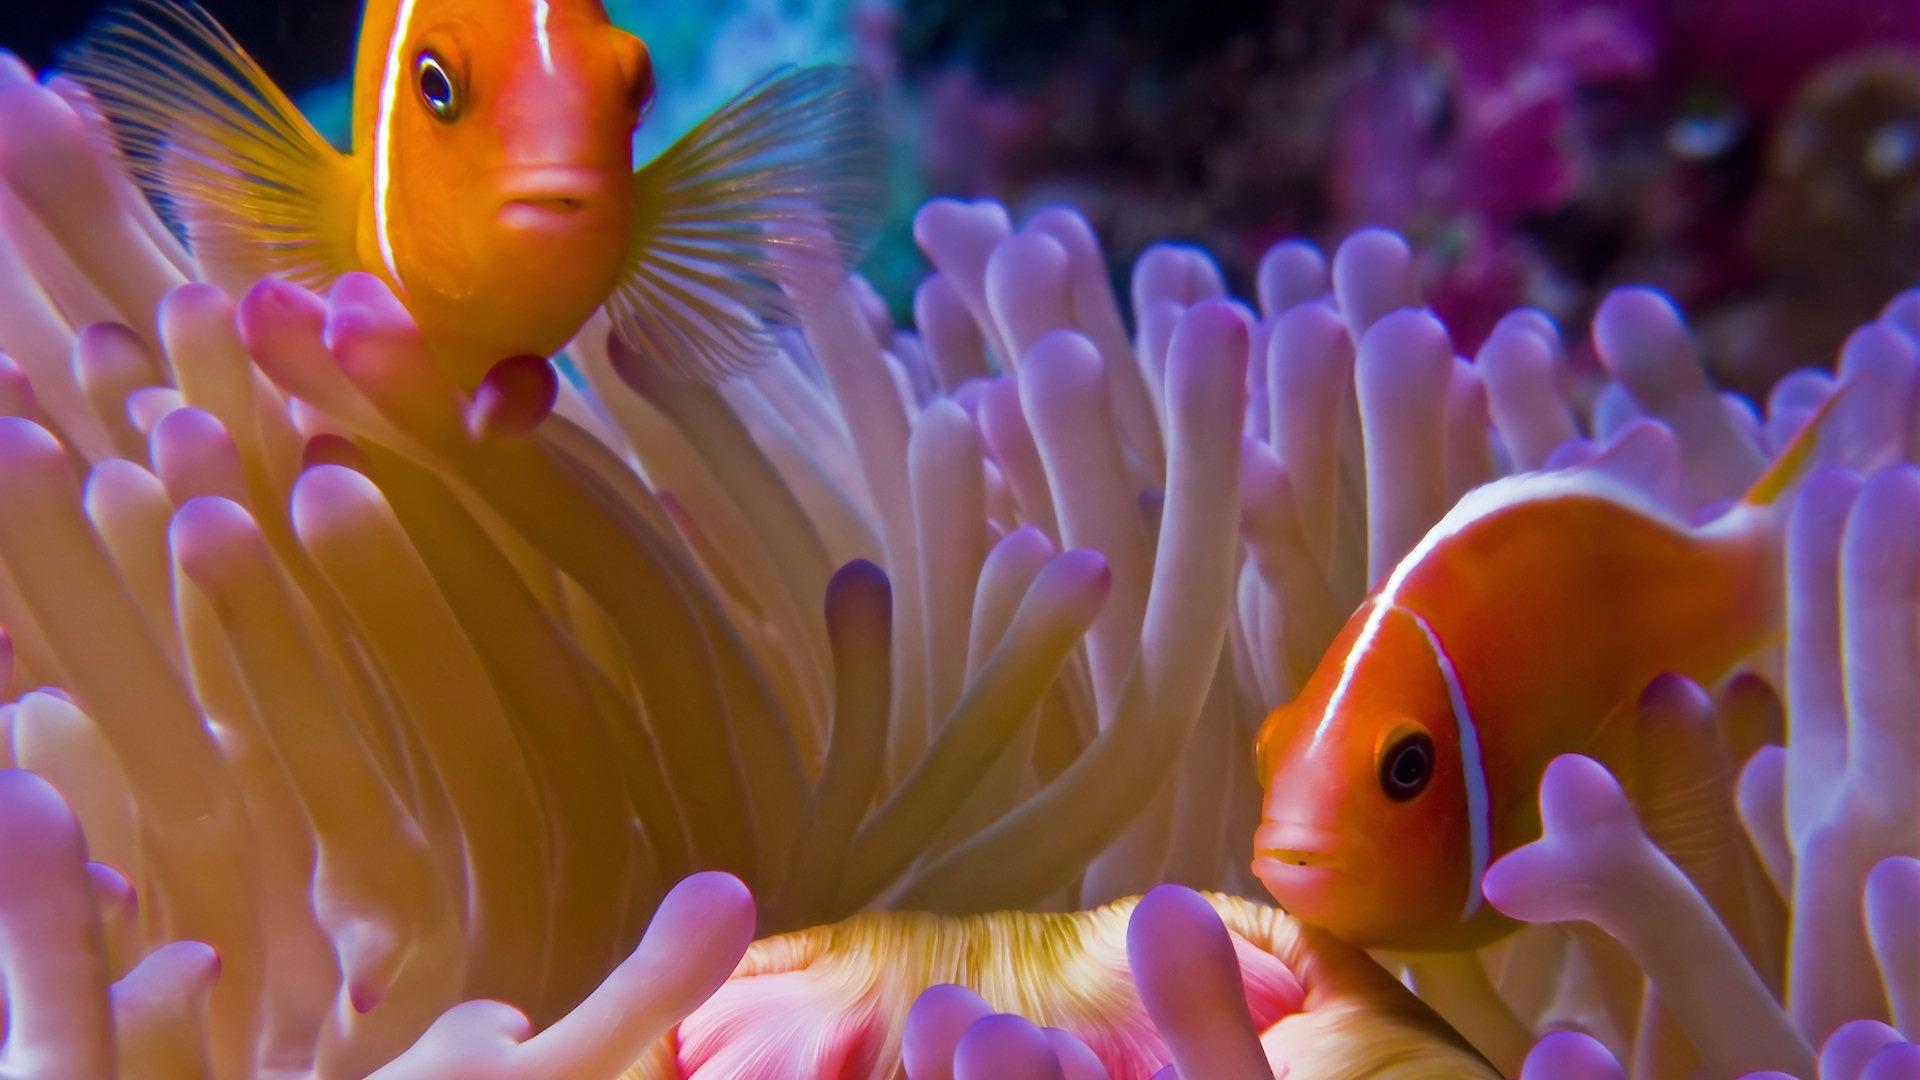 Clown Fish Hd Wallpaper Iphone 4 Poisson Clown Full Hd Fond D 233 Cran And Arri 232 Re Plan